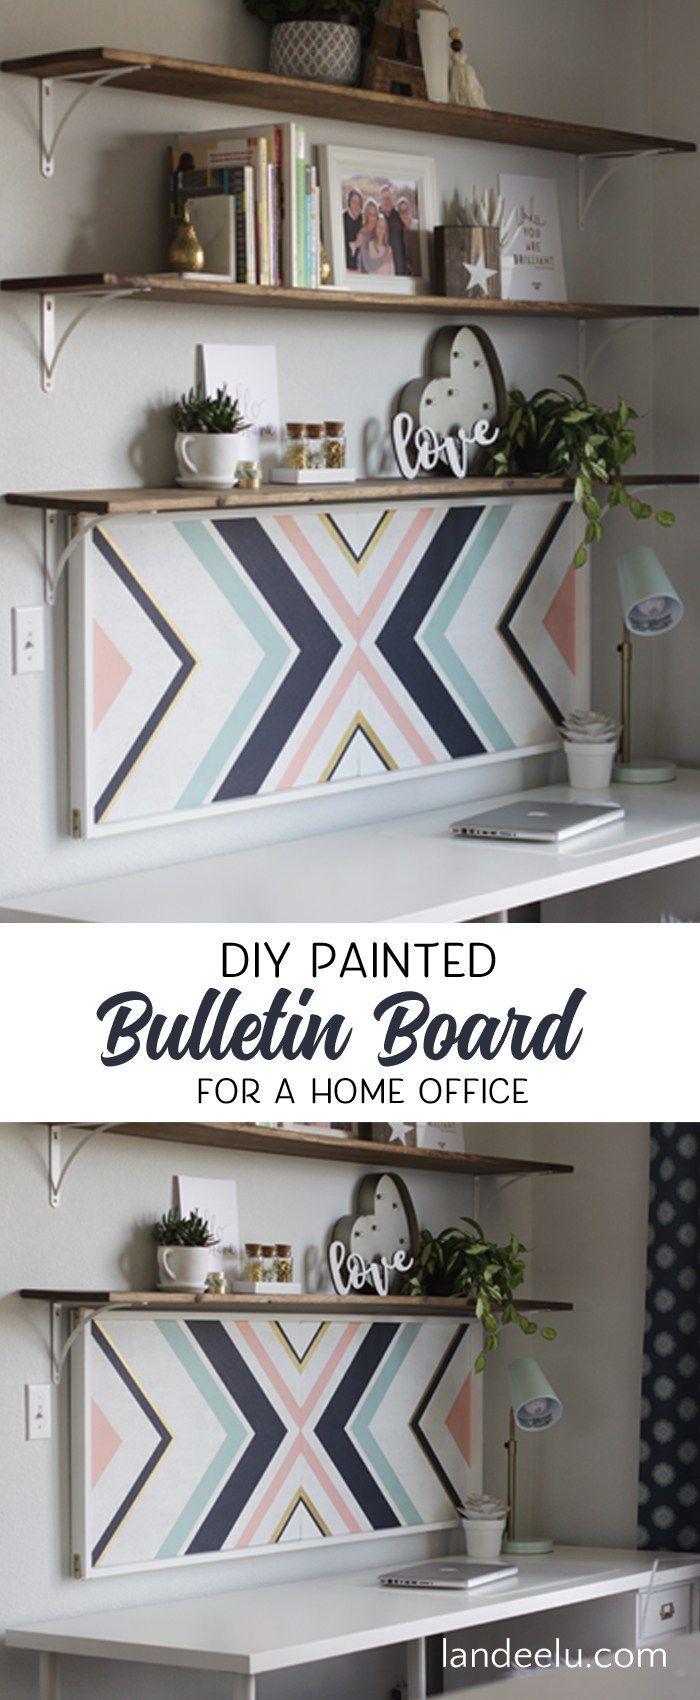 Amazingly Stylish DIY Cork Board You Will Want to Make   Pinterest